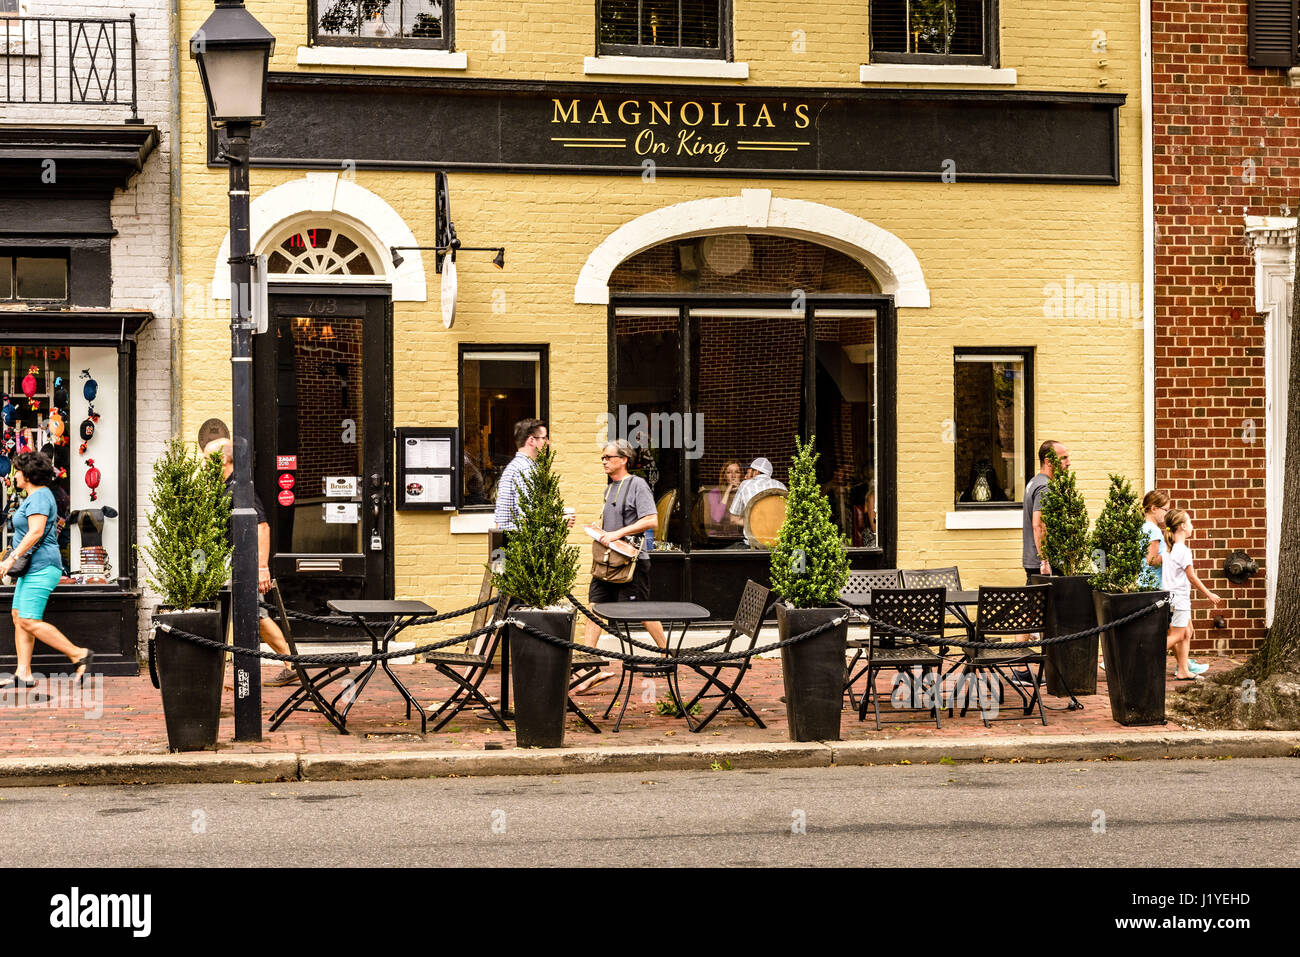 Magnolia's on King, King Street, Old Town Alexandria, Virginia - Stock Image